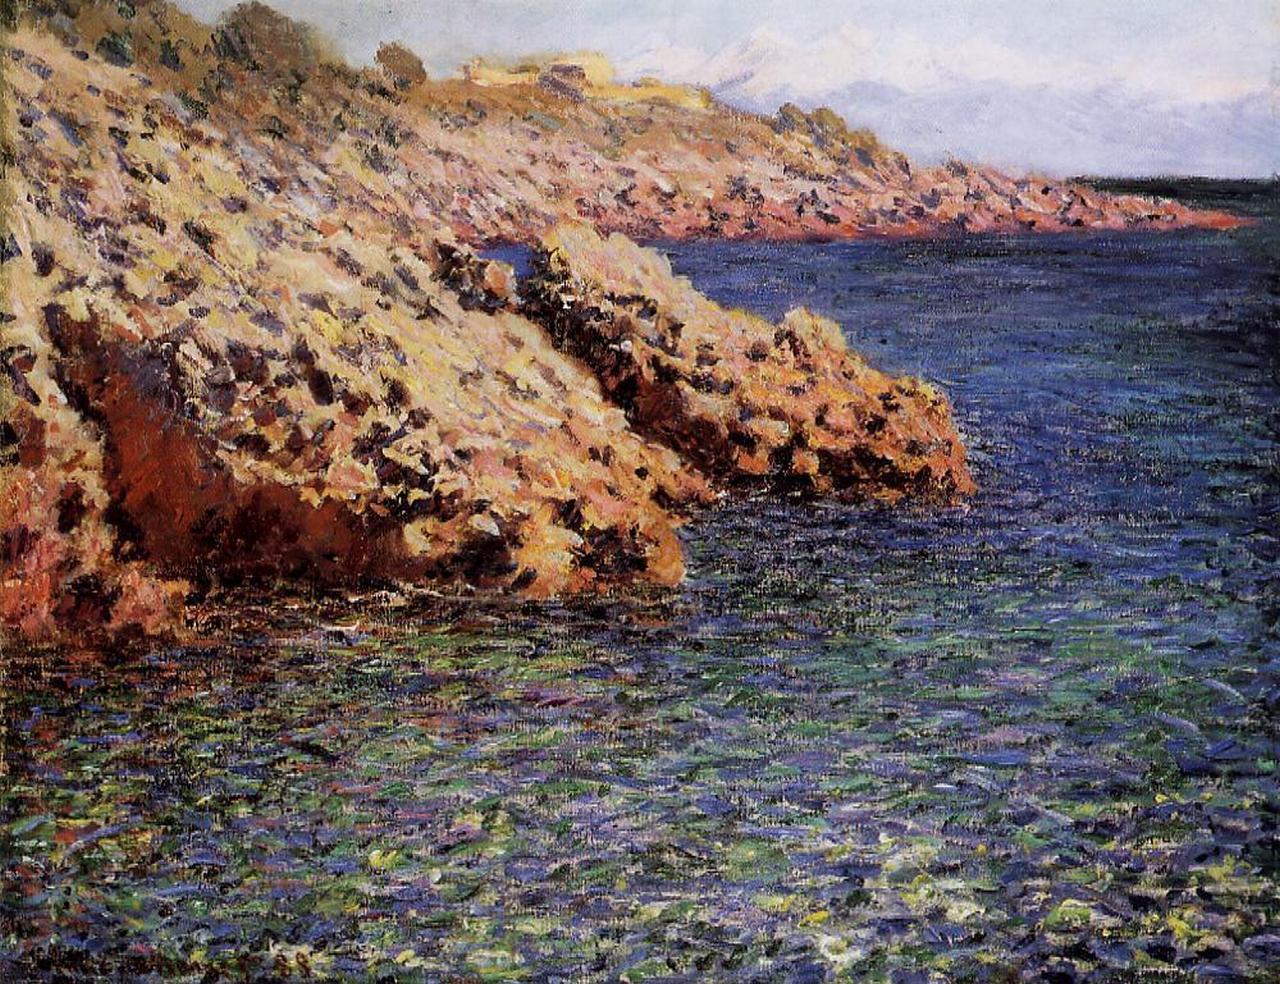 скалы и море < Камни на берегу Средиземного моря>:: Клод Моне, описание картины - Claude Monet фото